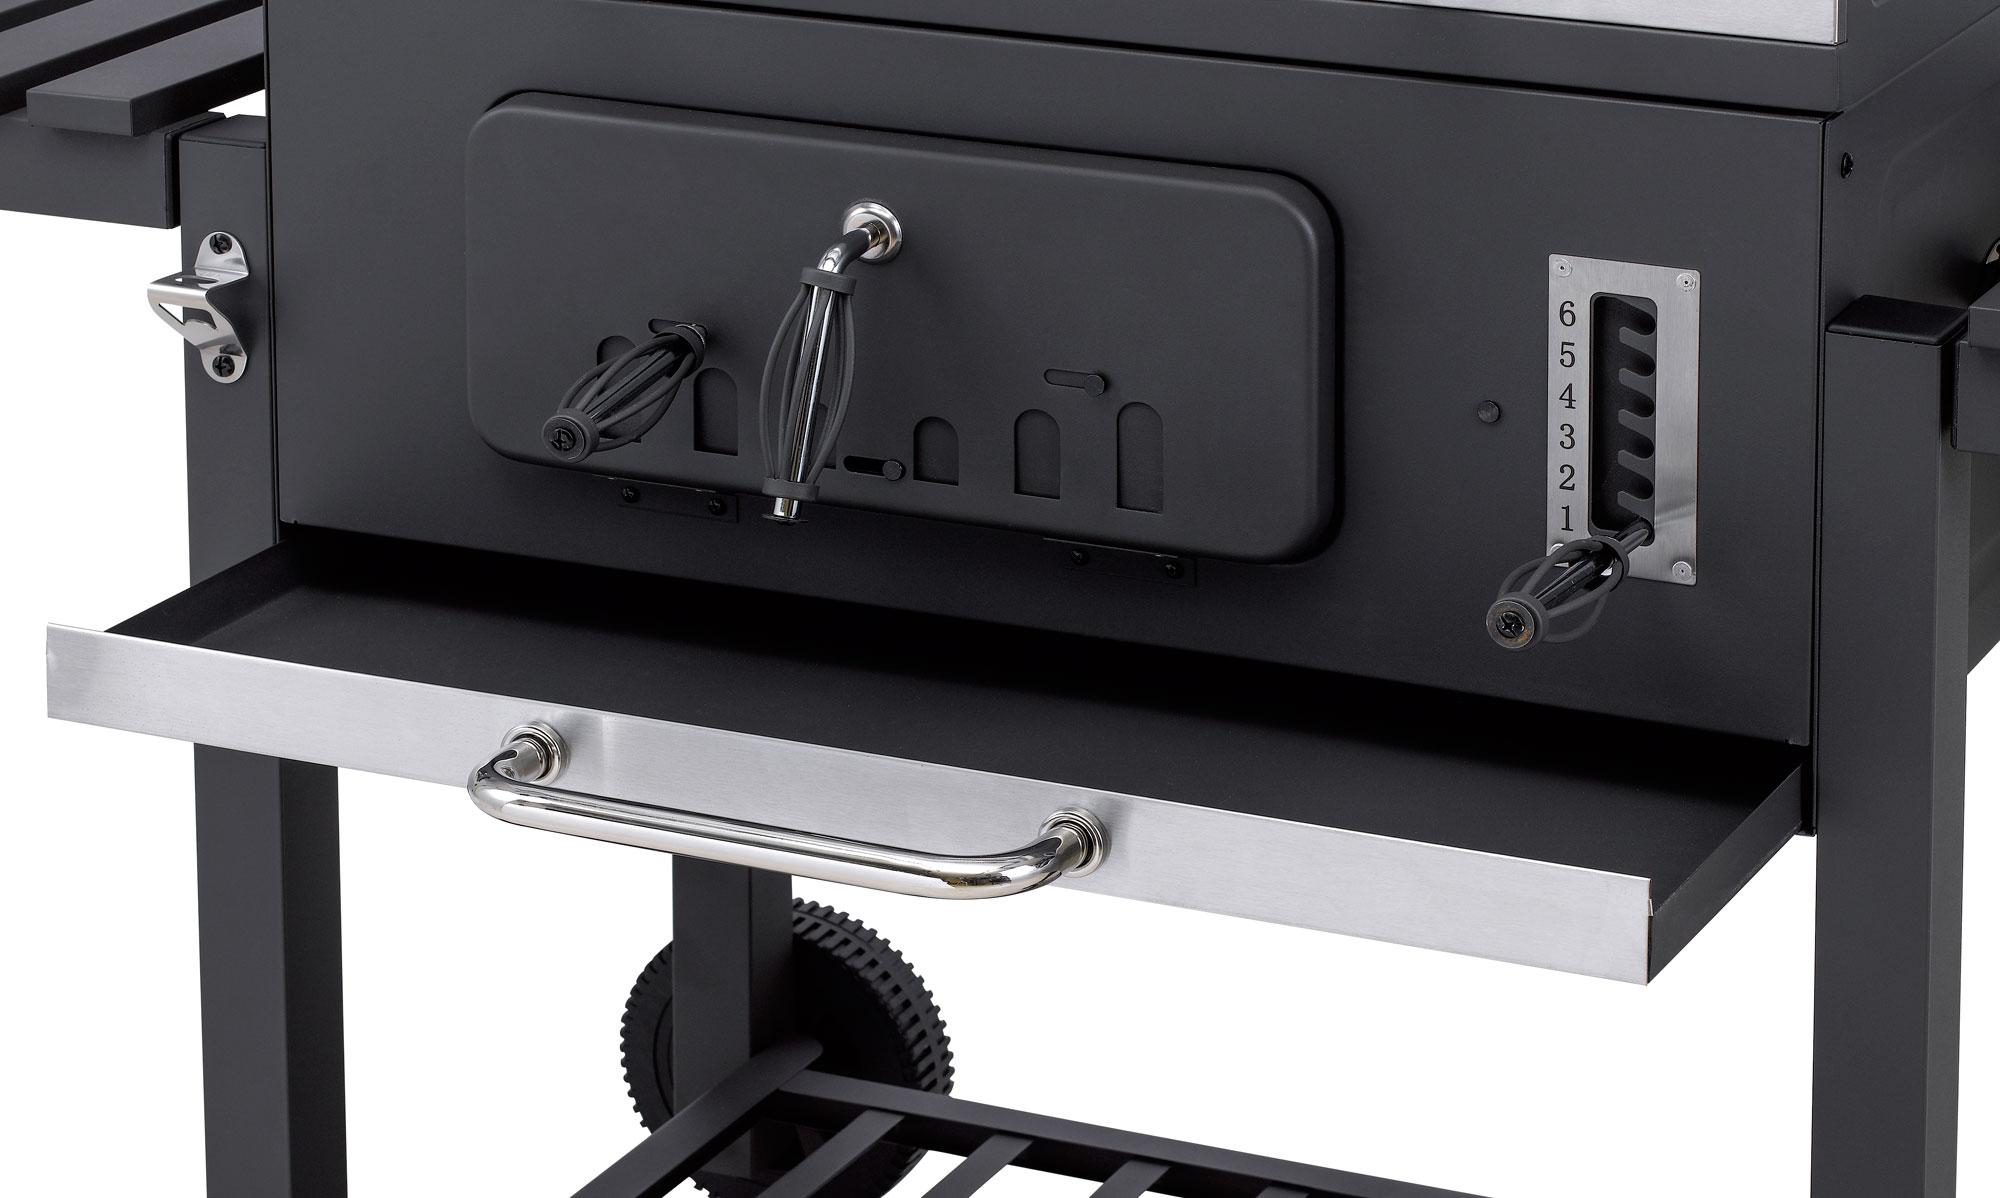 Tepro Holzkohlegrill Xxl : Tepro holzkohlegrill grillwagen toronto xxl grillfläche cm